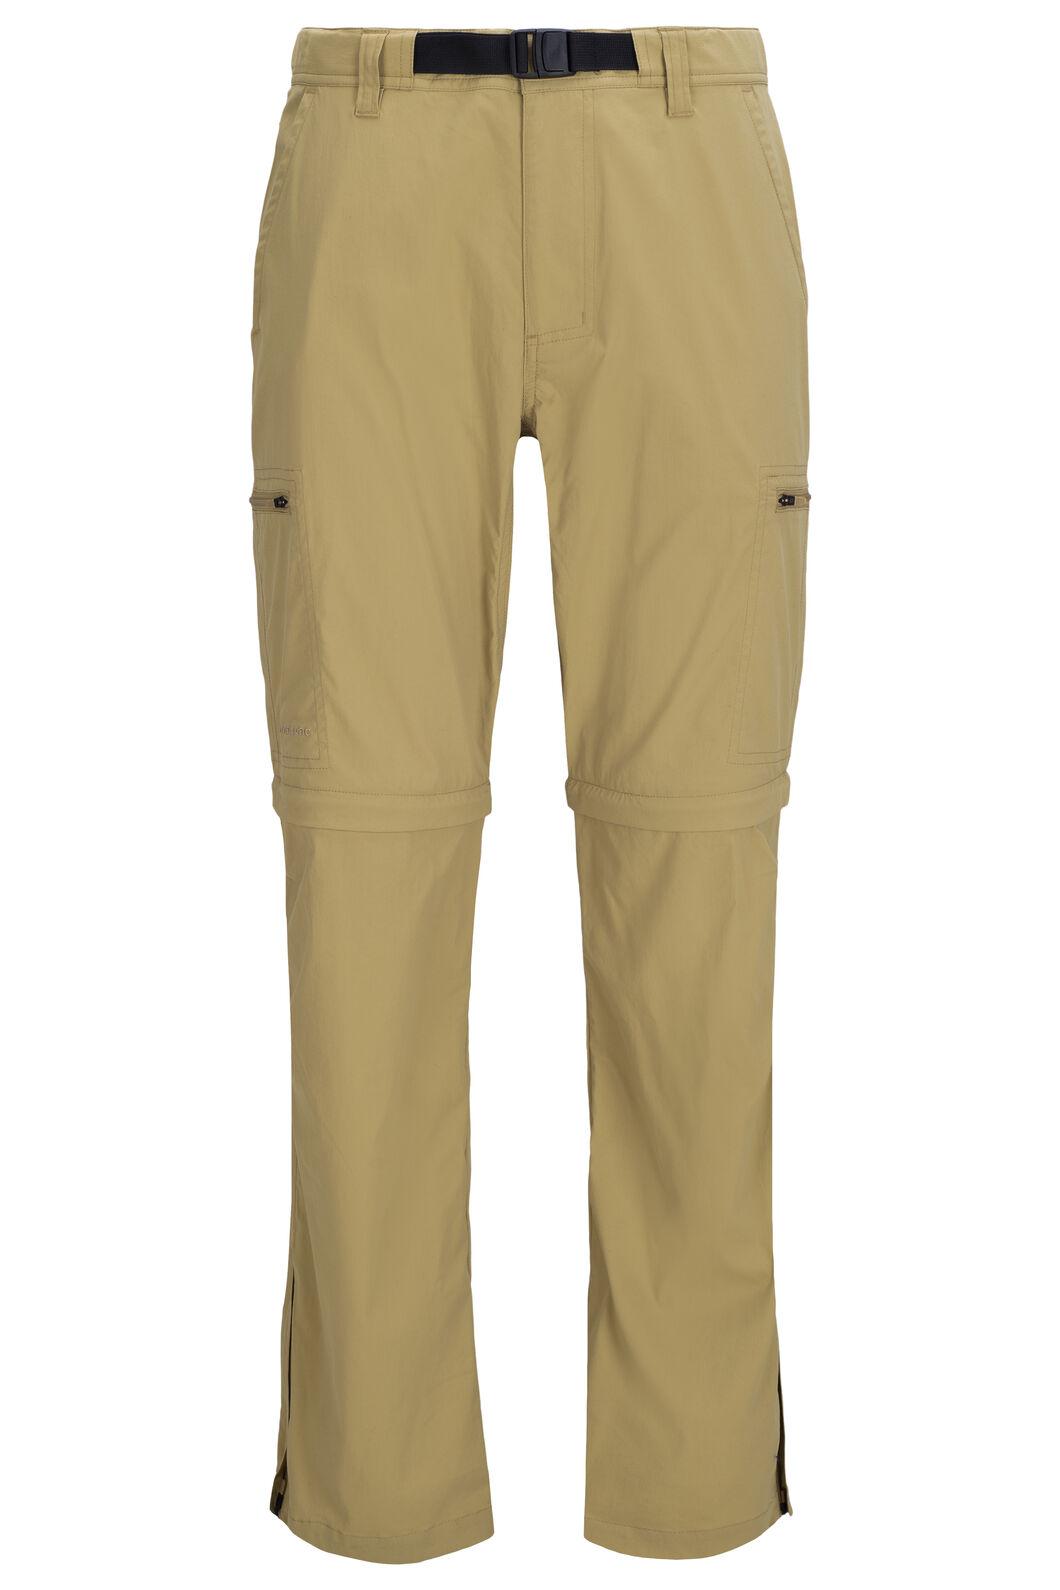 Macpac Rockover Convertible Pants — Men's, Khaki, hi-res